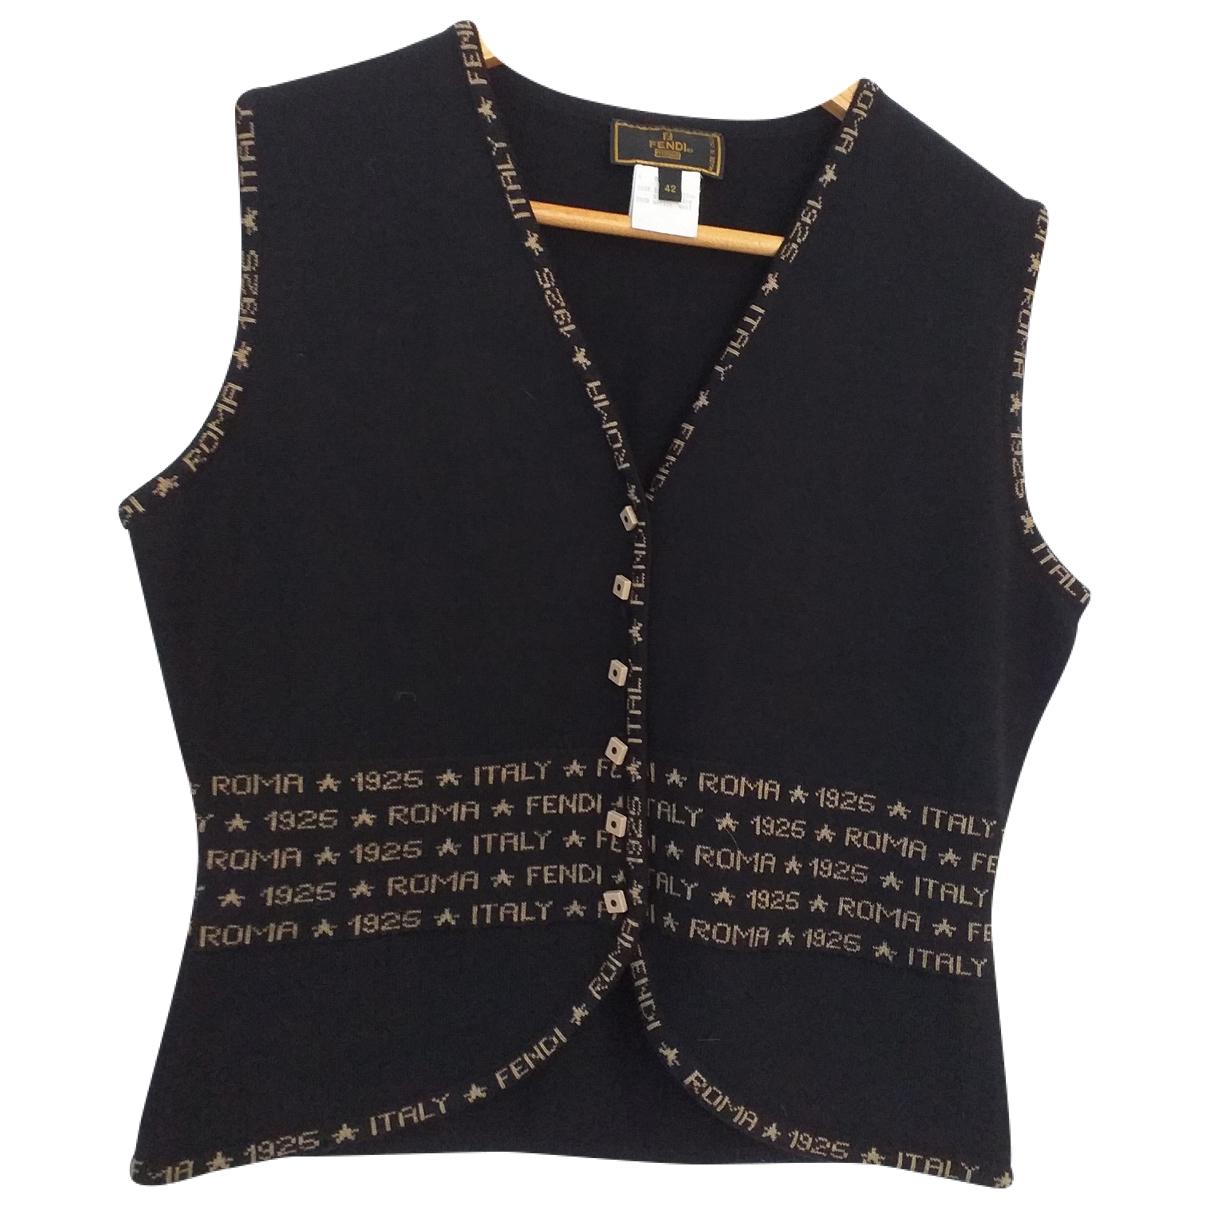 Camiseta sin mangas de Lana Fendi